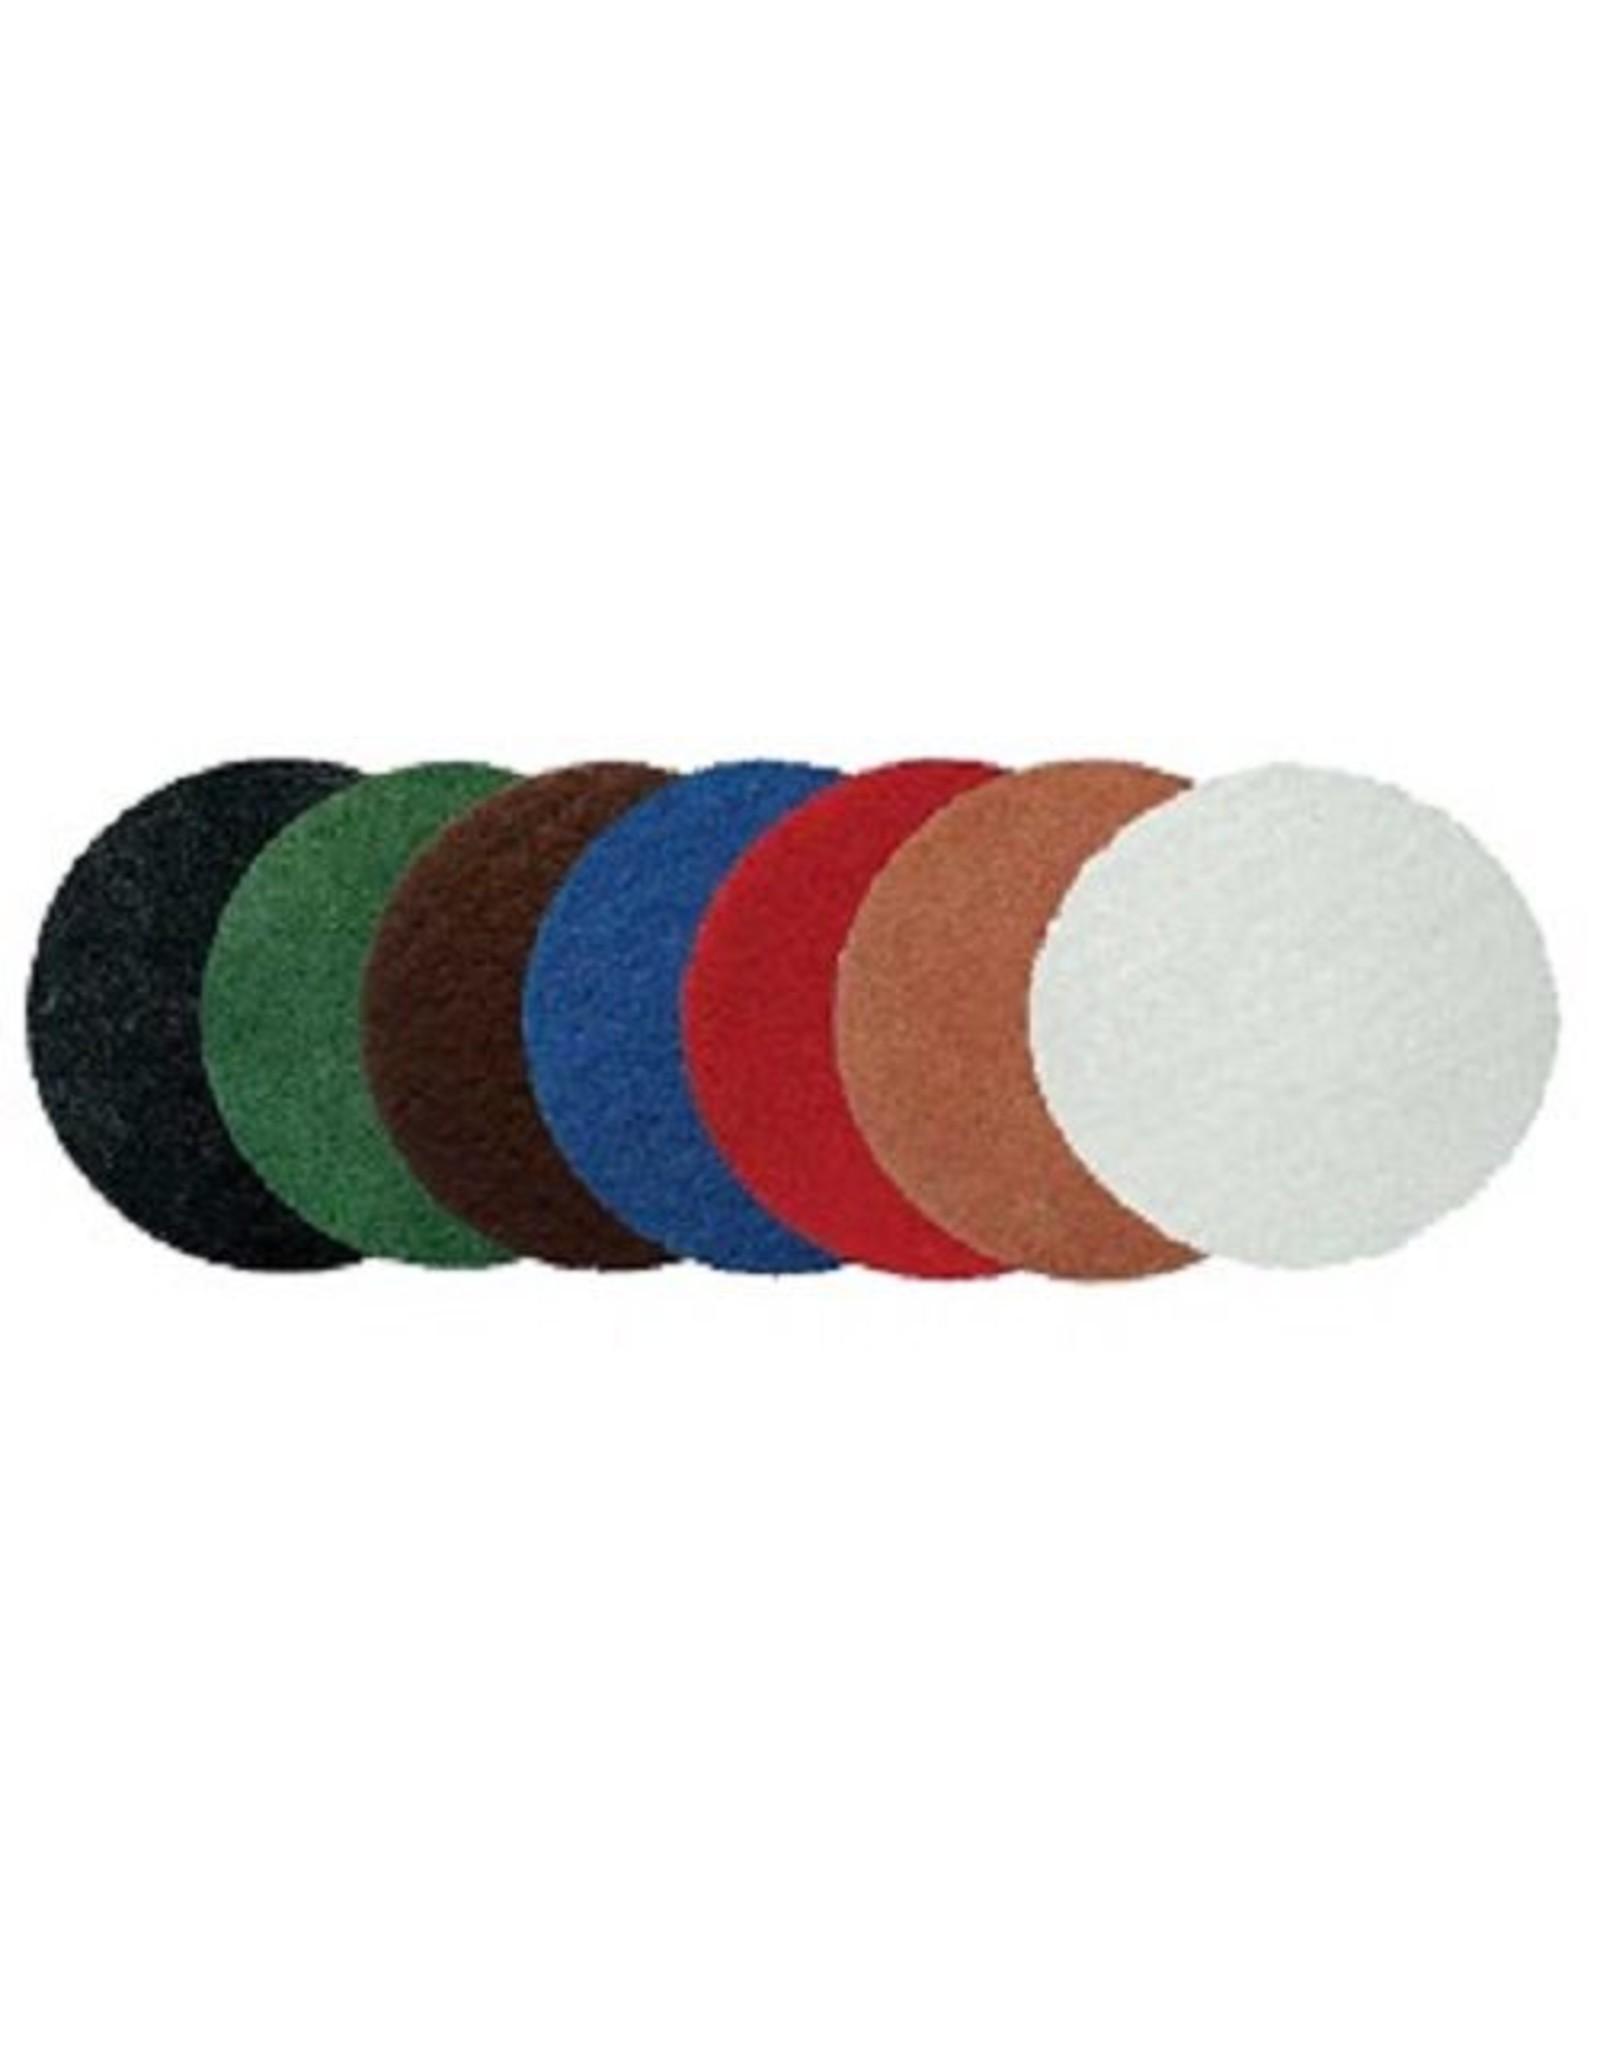 ACOR Nylon Pads Blauw - 40 CM, 2 CM, 16 inch (High Quality)